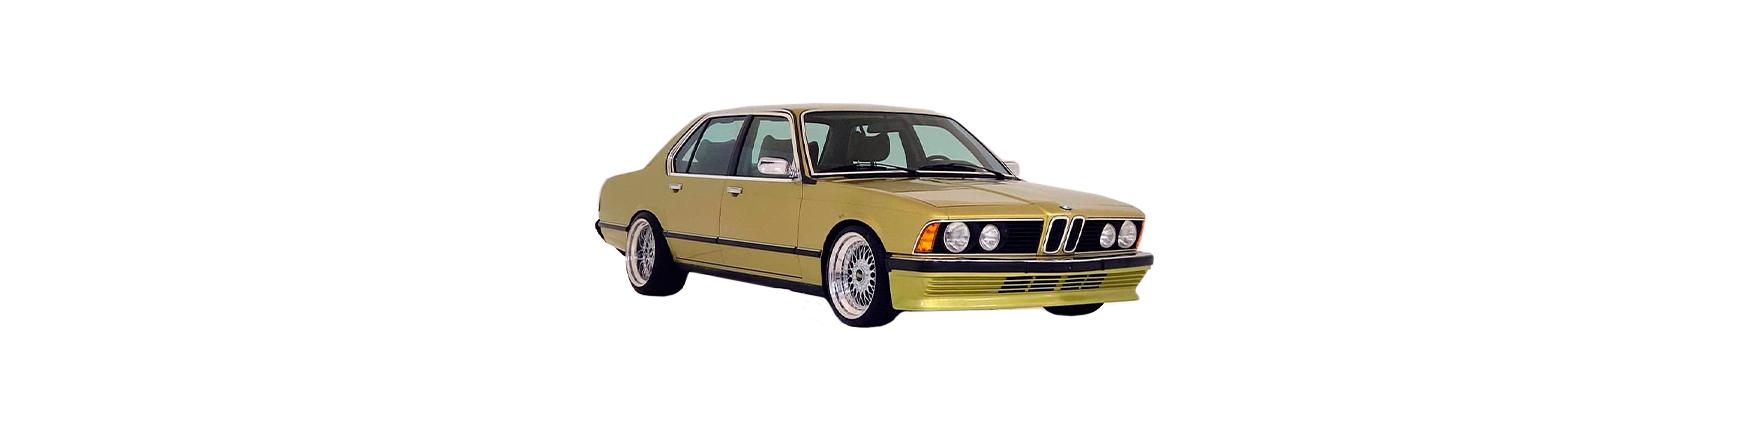 bmw serie 7 e23 1981 1982 1983 1984 1985 1986 1987 venta recambios